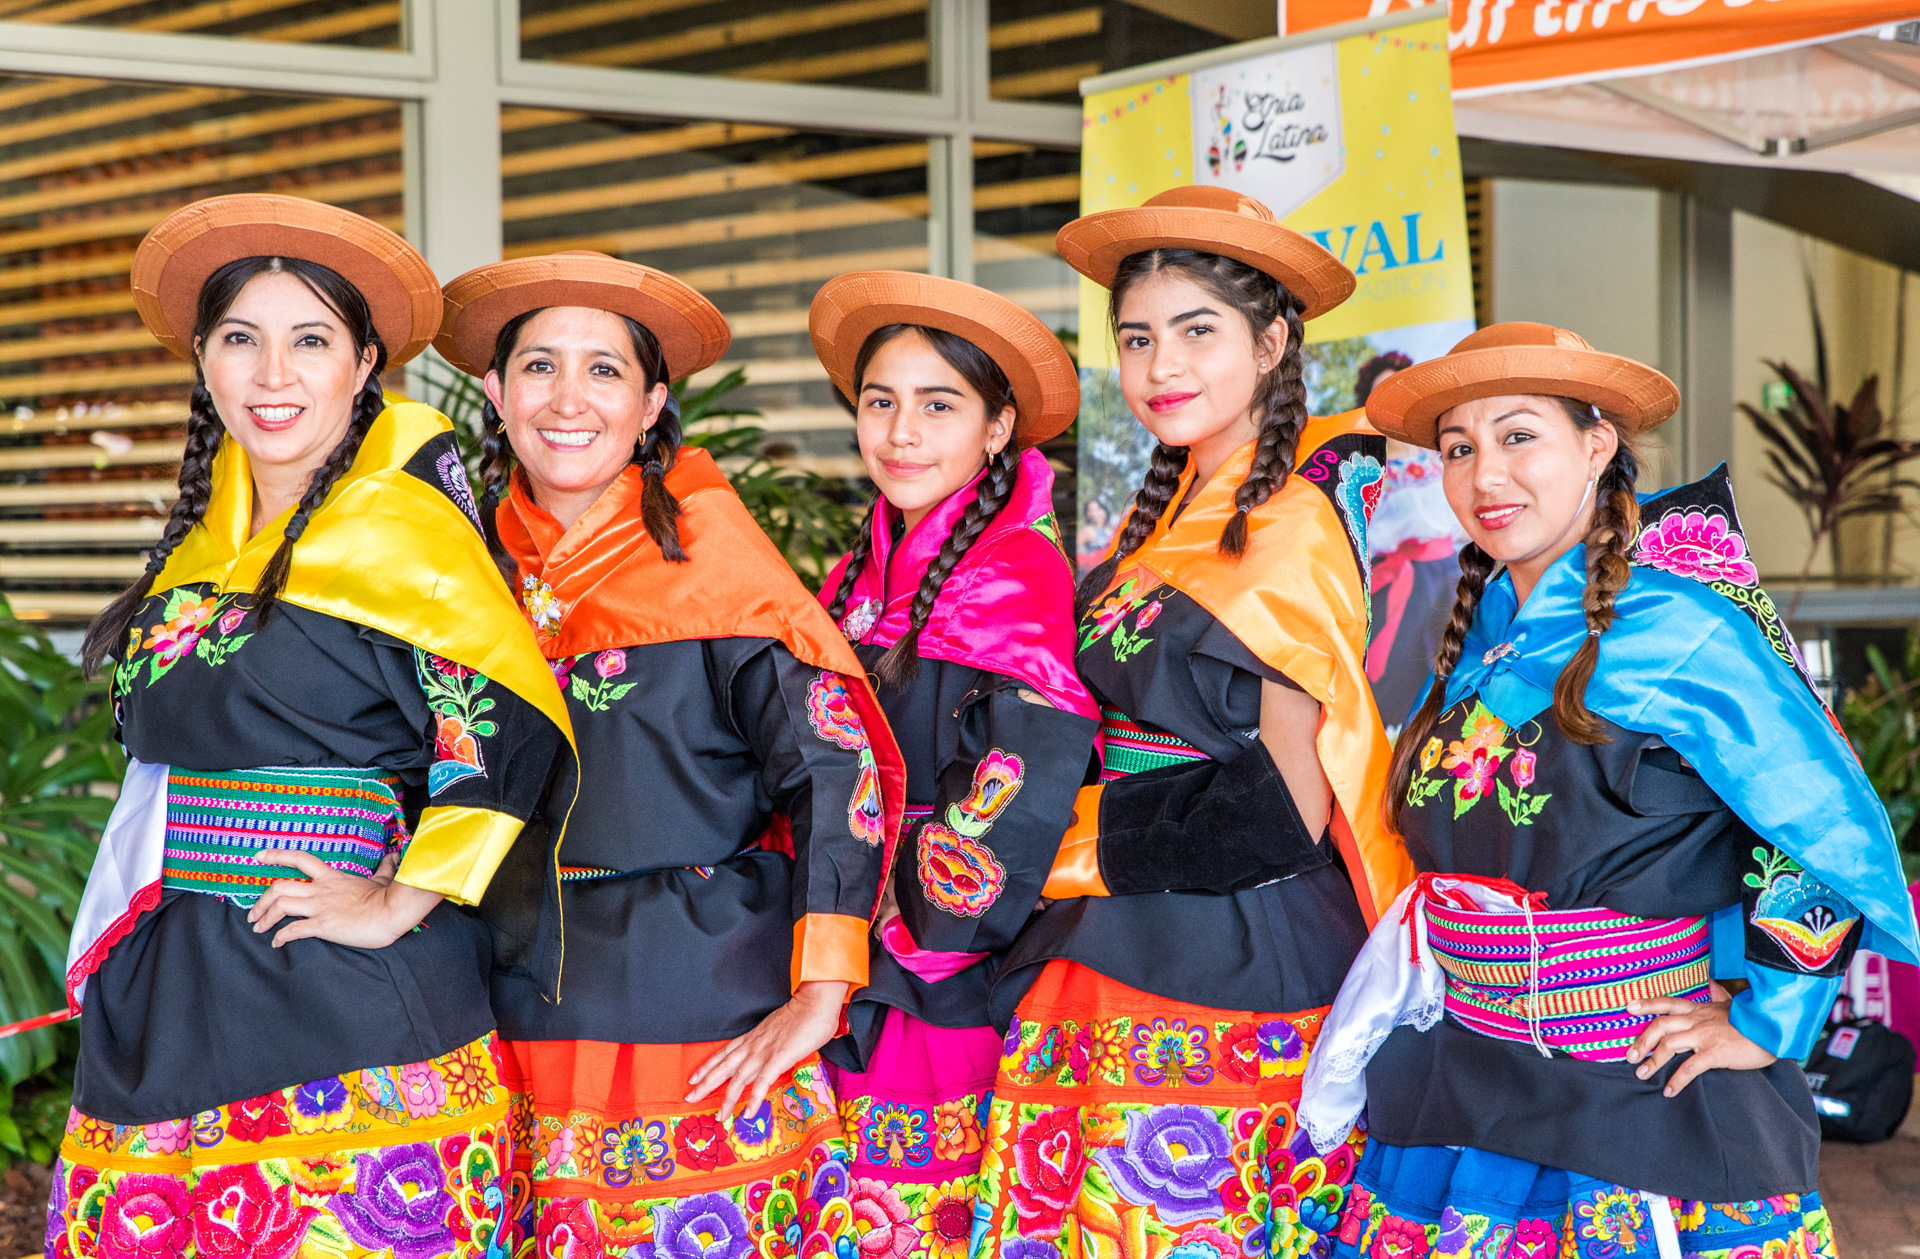 Dancers at Etnia Latina Festival